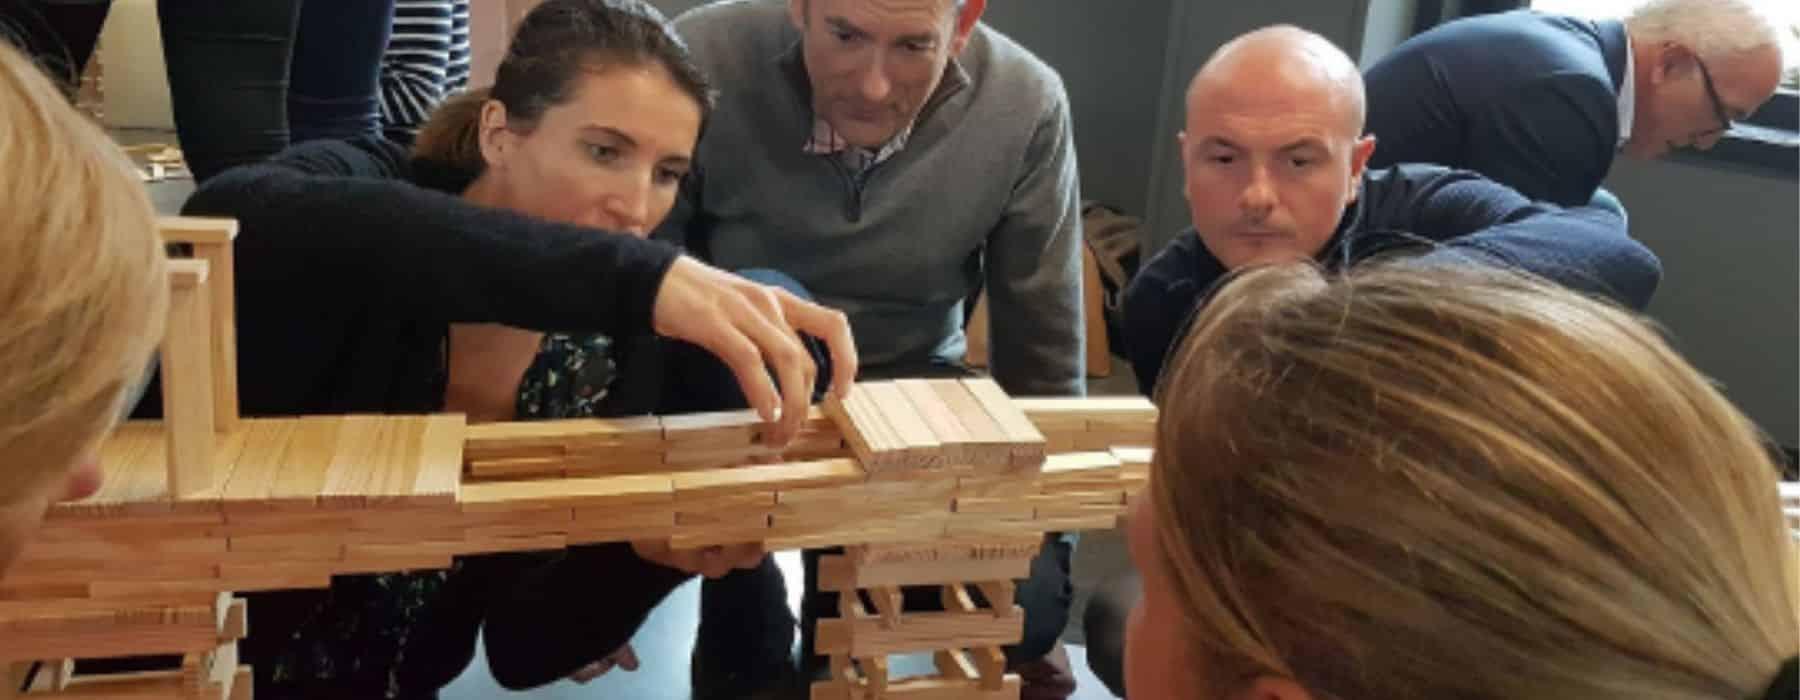 TEAM BUILDING CHALLENGE KAPLA (1)